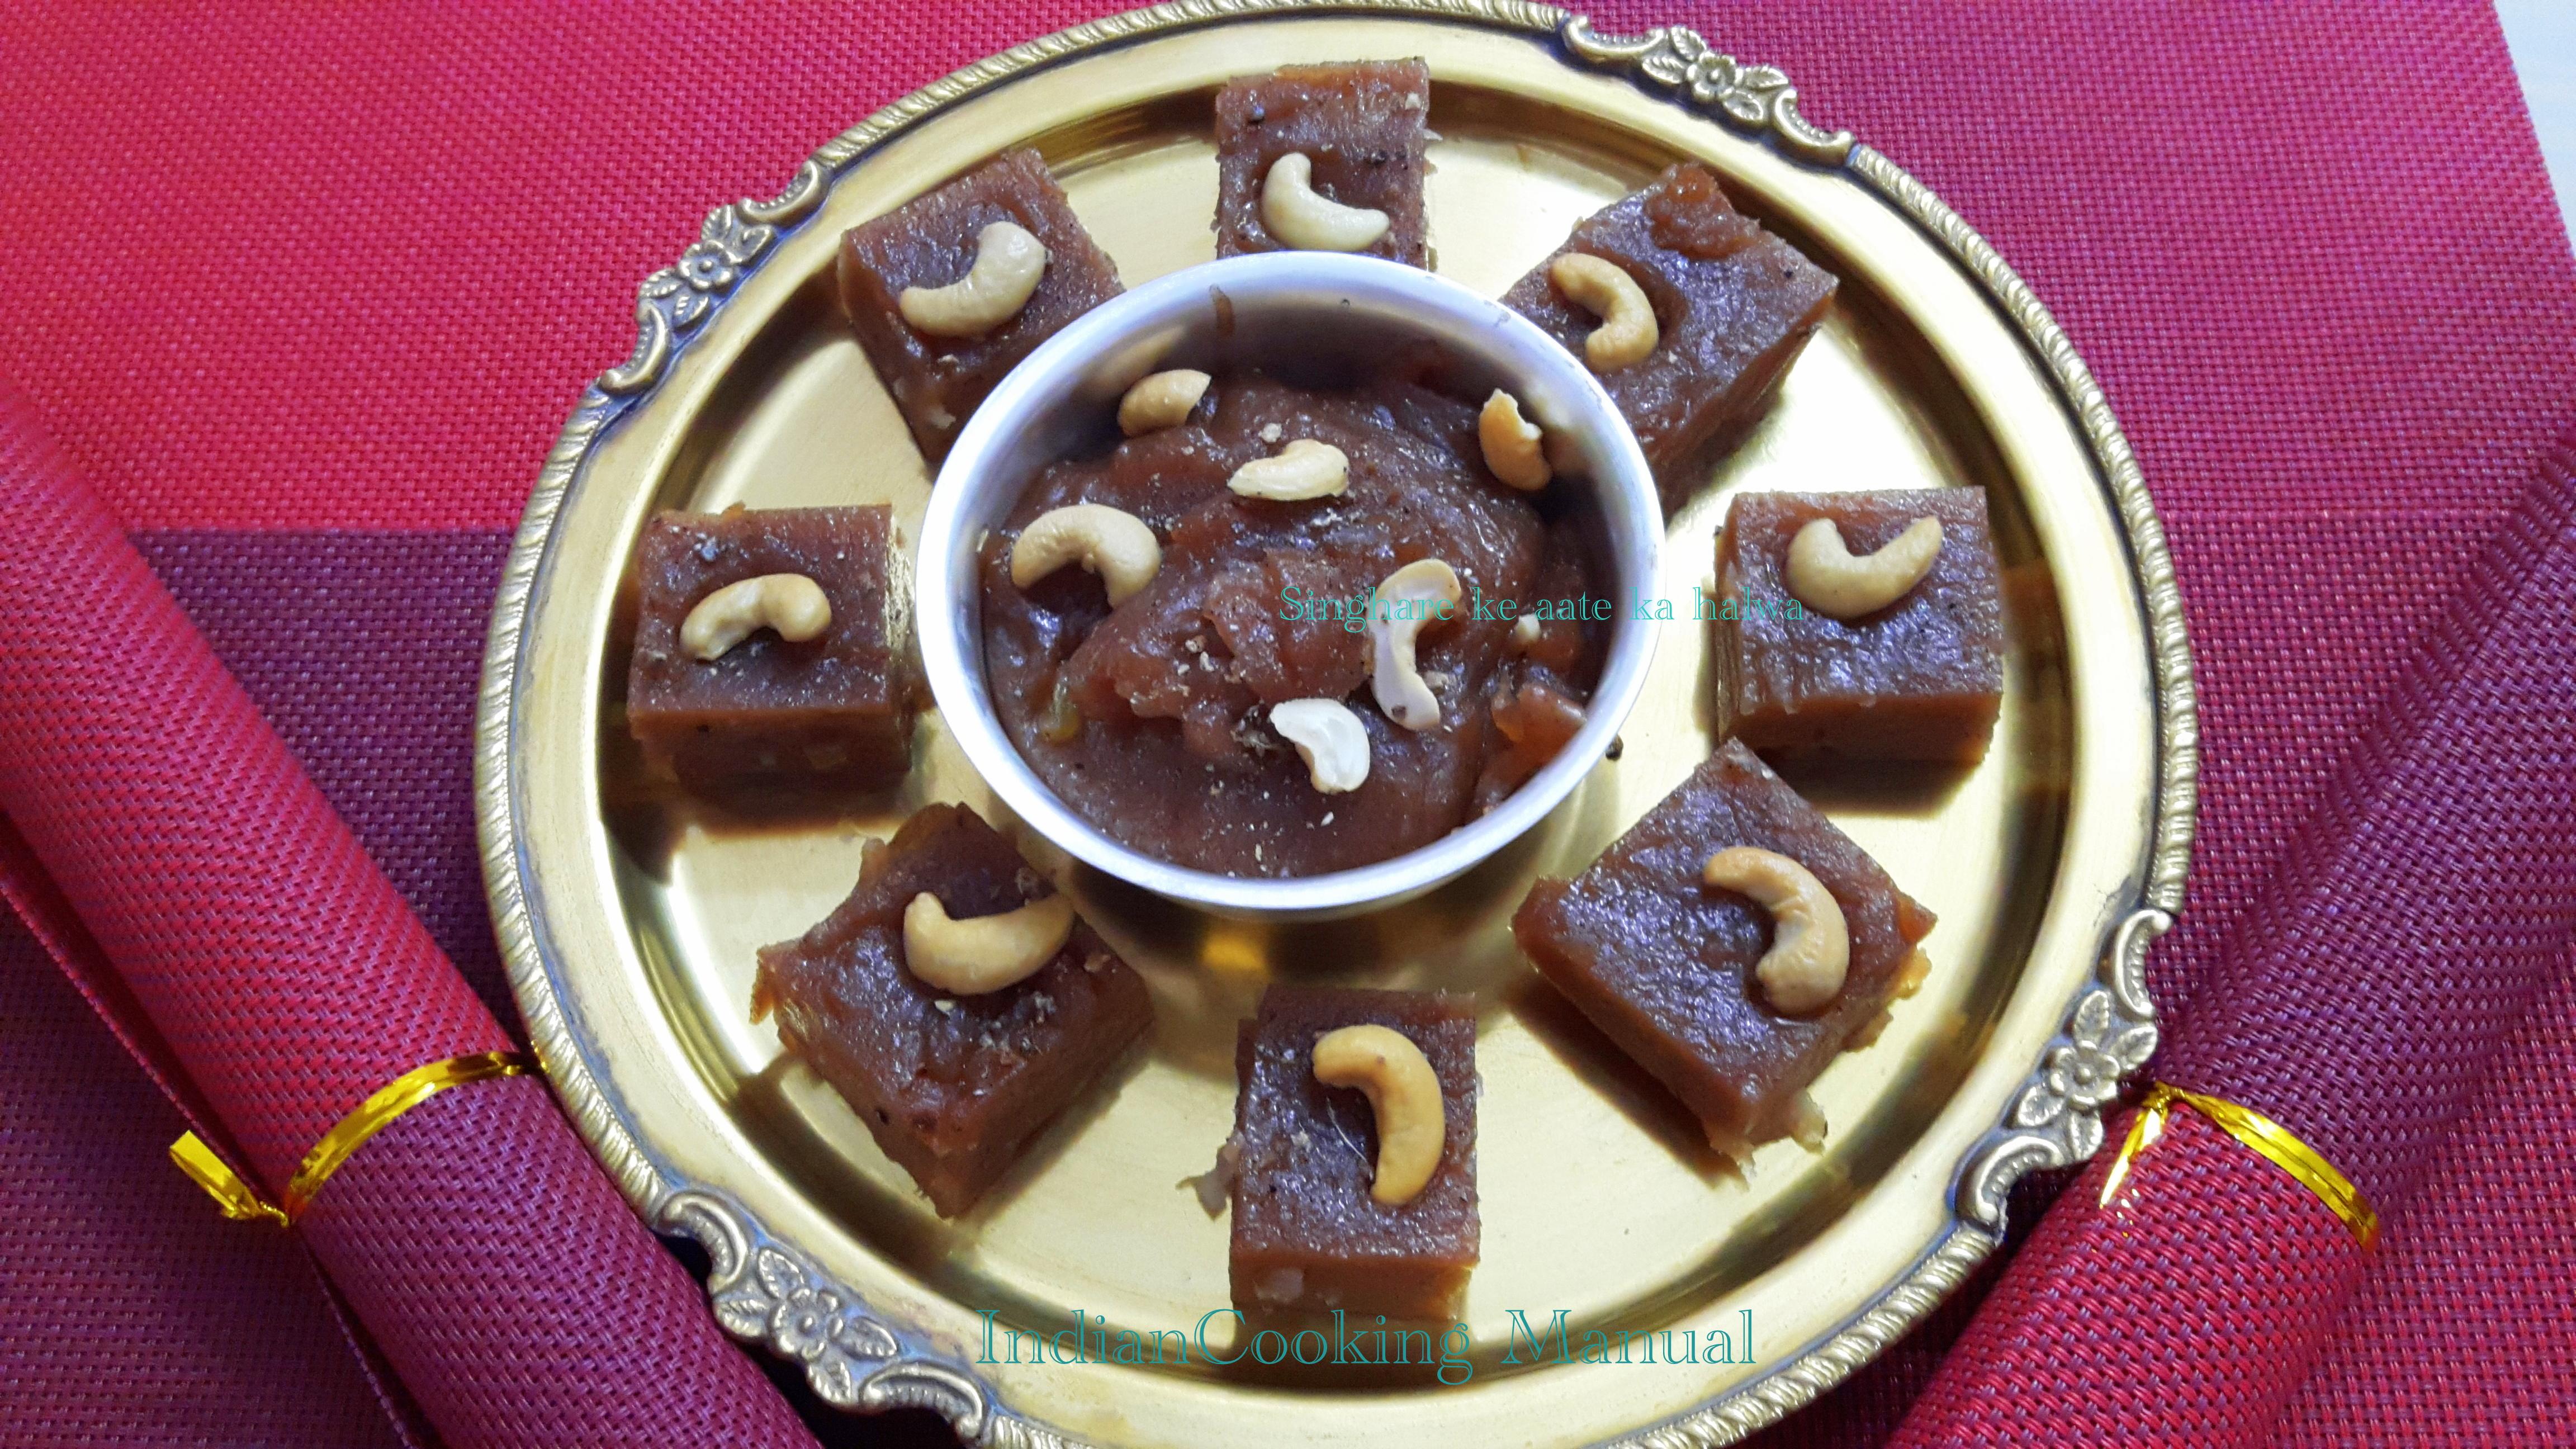 Singhare ke aate ka halwa (water chestnut porridge)